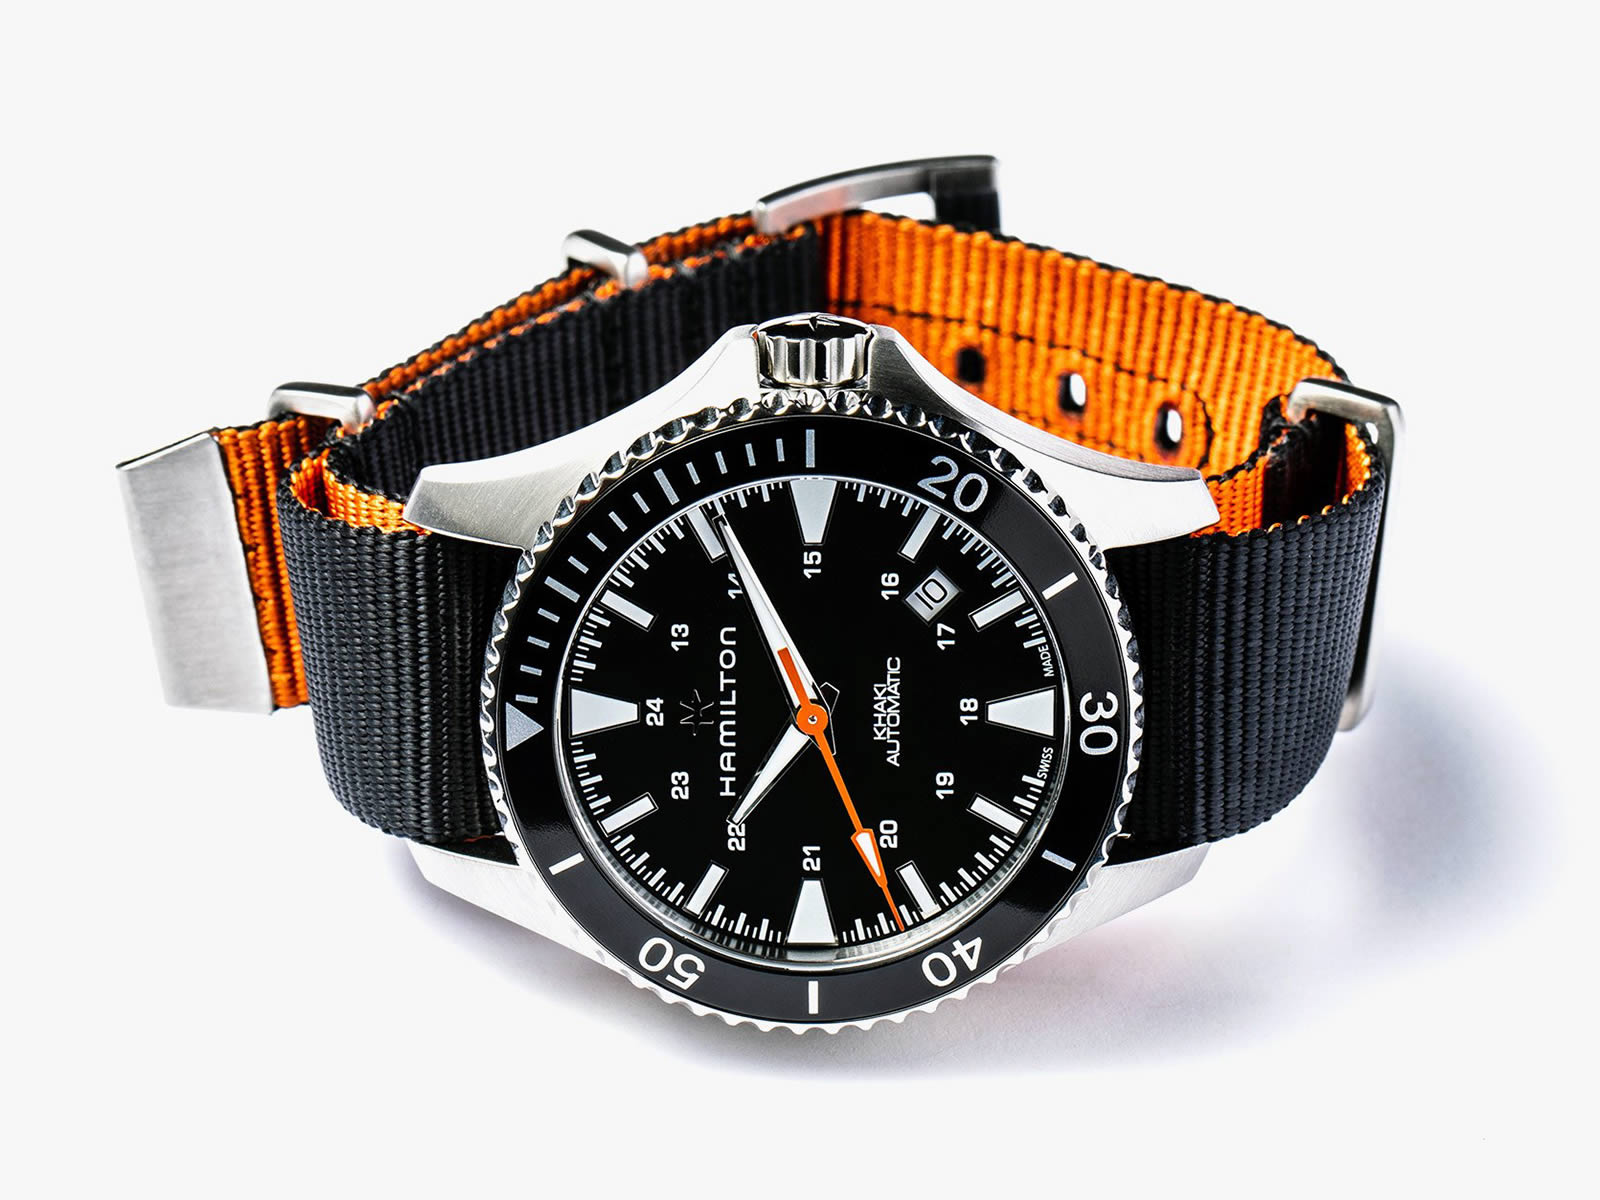 h82335031-hamilton-khaki-navy-scuba-auto-gear-patrol-special-edition-8-.jpg